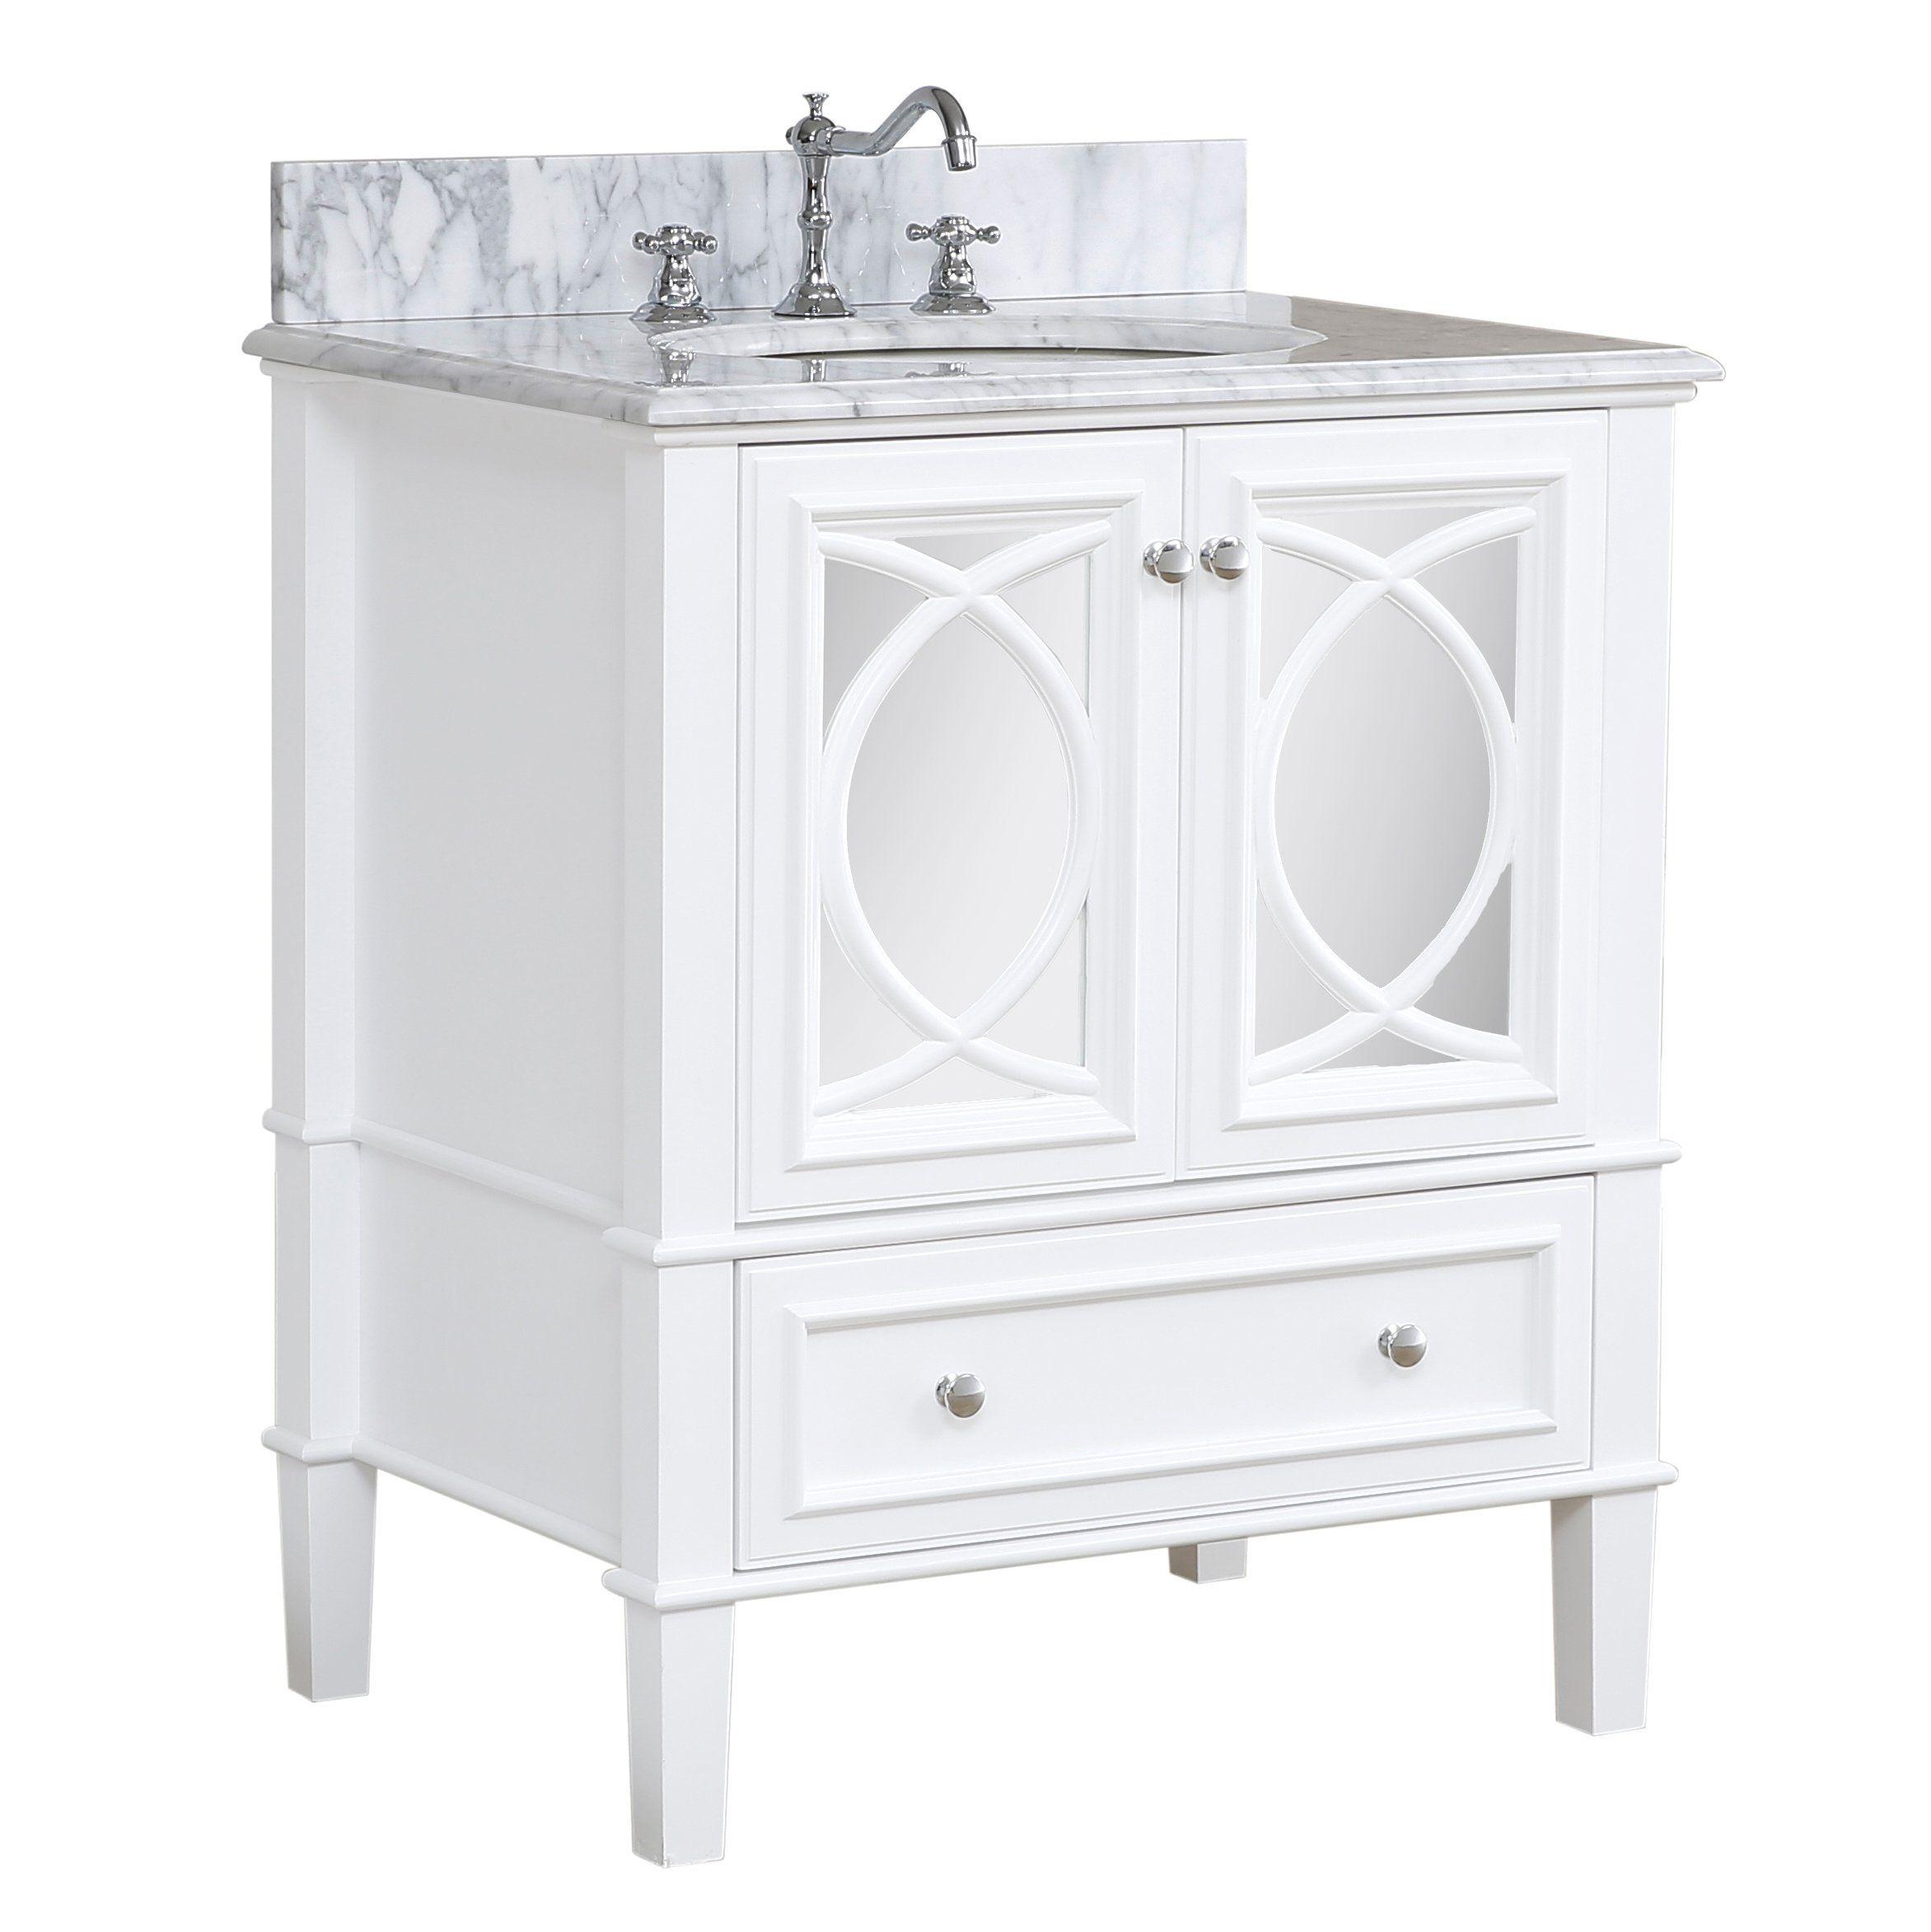 Olivia 30 Inch Vanity Carrara White 30 Inch Bathroom Vanity